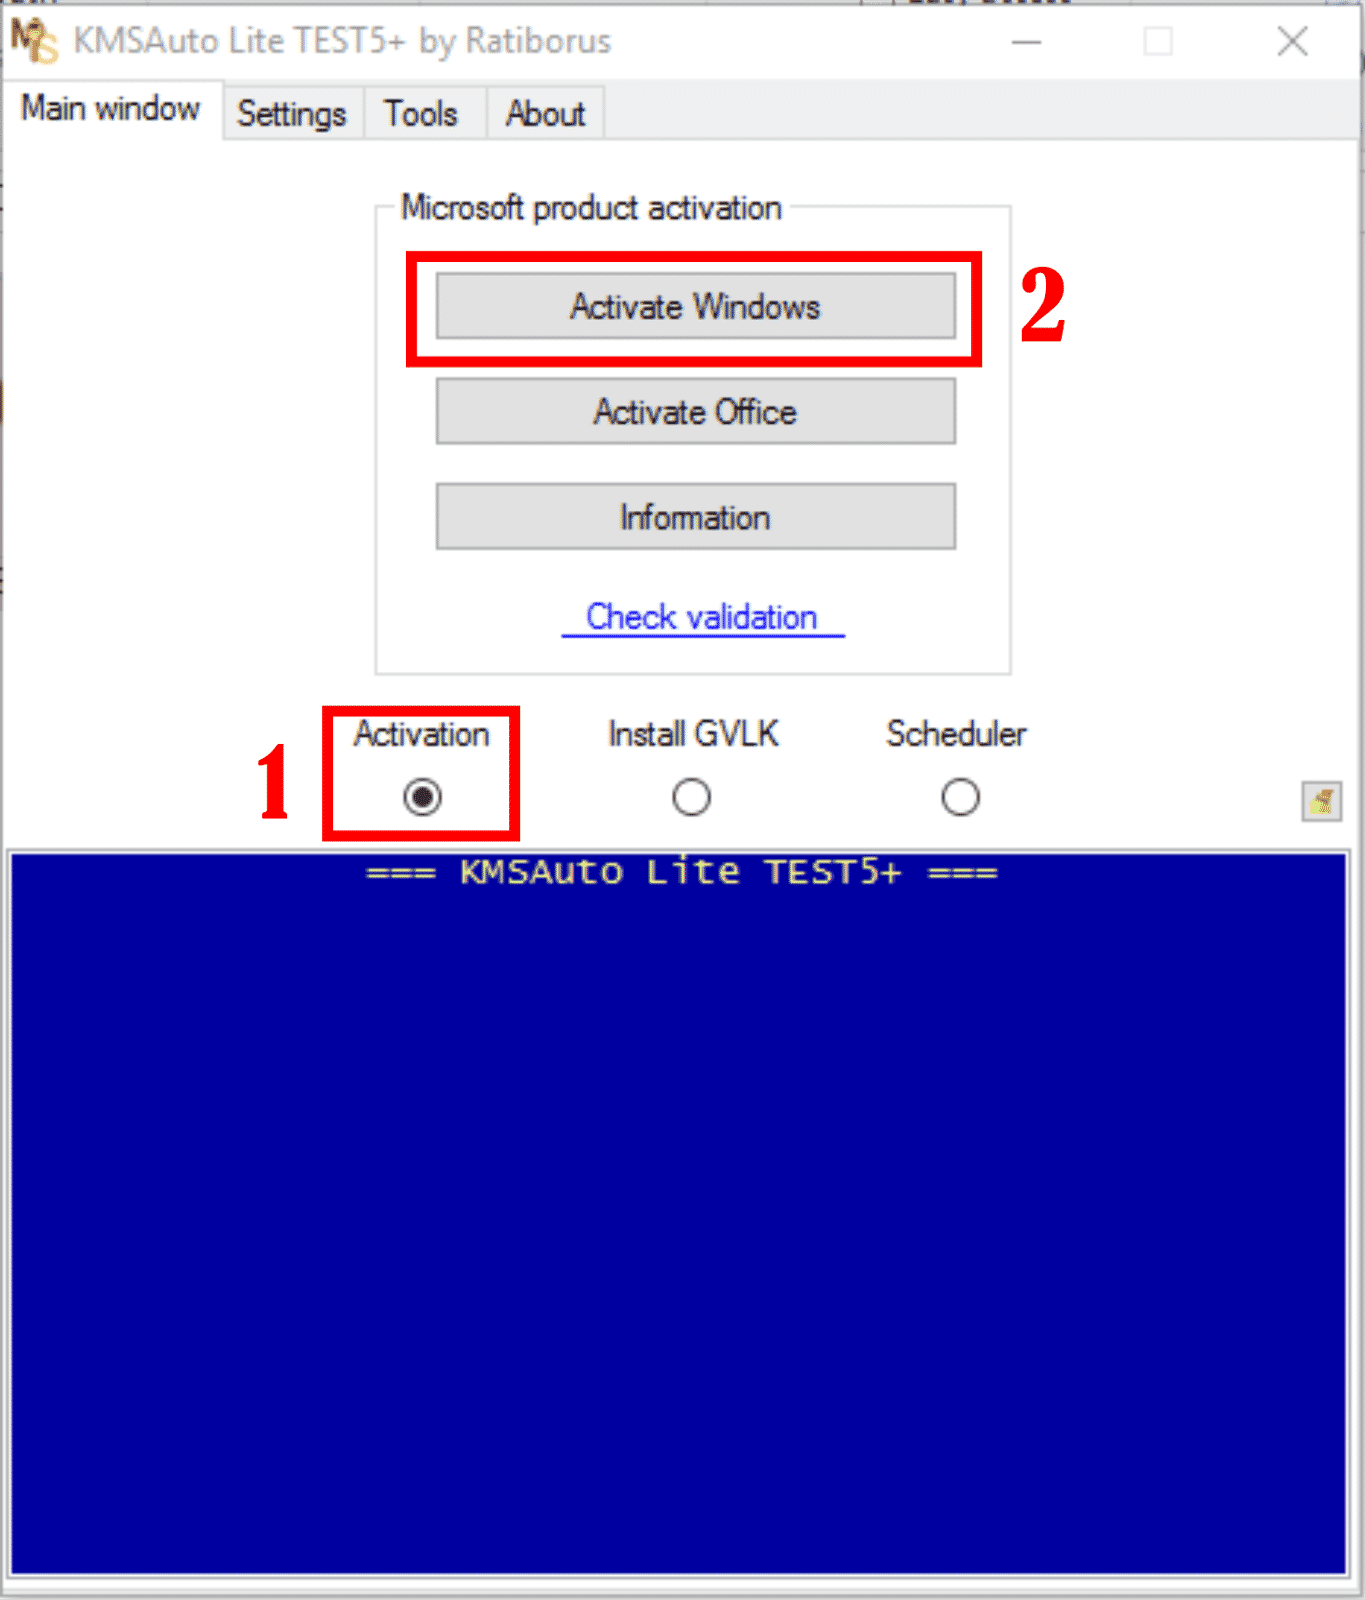 Berikutnya-klik-activate-Windows-agar-Windows-8-langsung-aktif-dan-dapat-digunakan